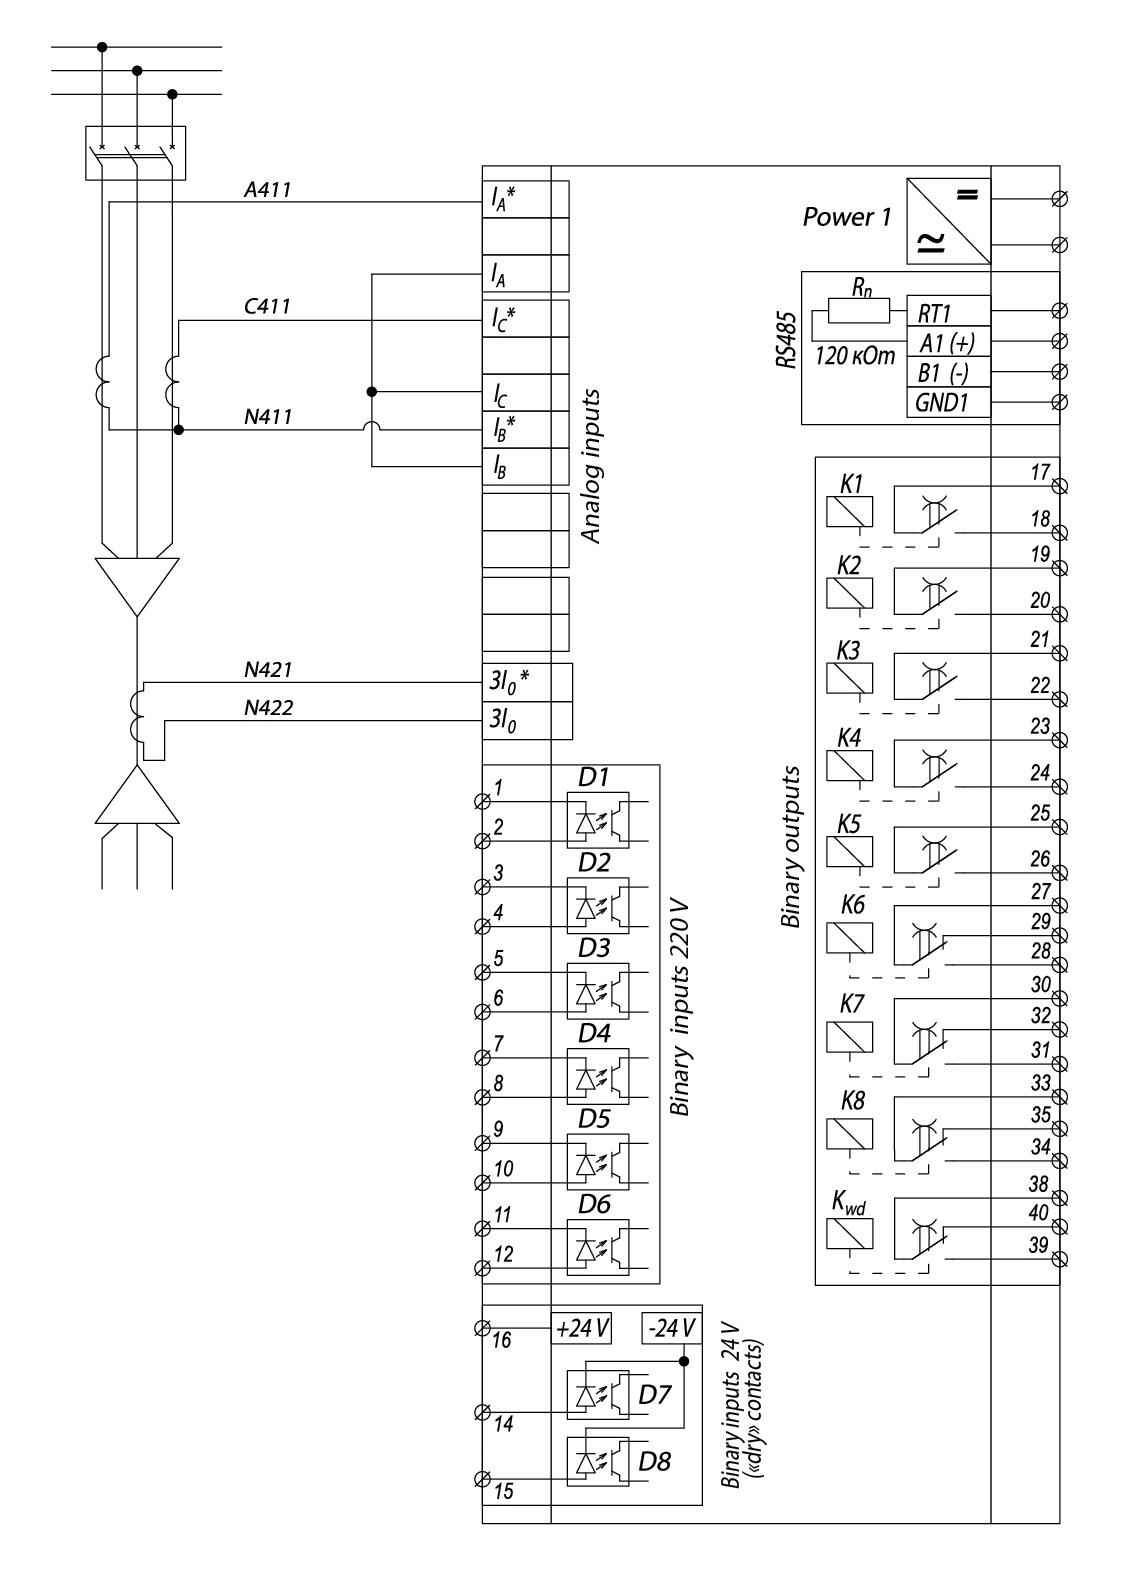 RZL-05.M1 - wiring